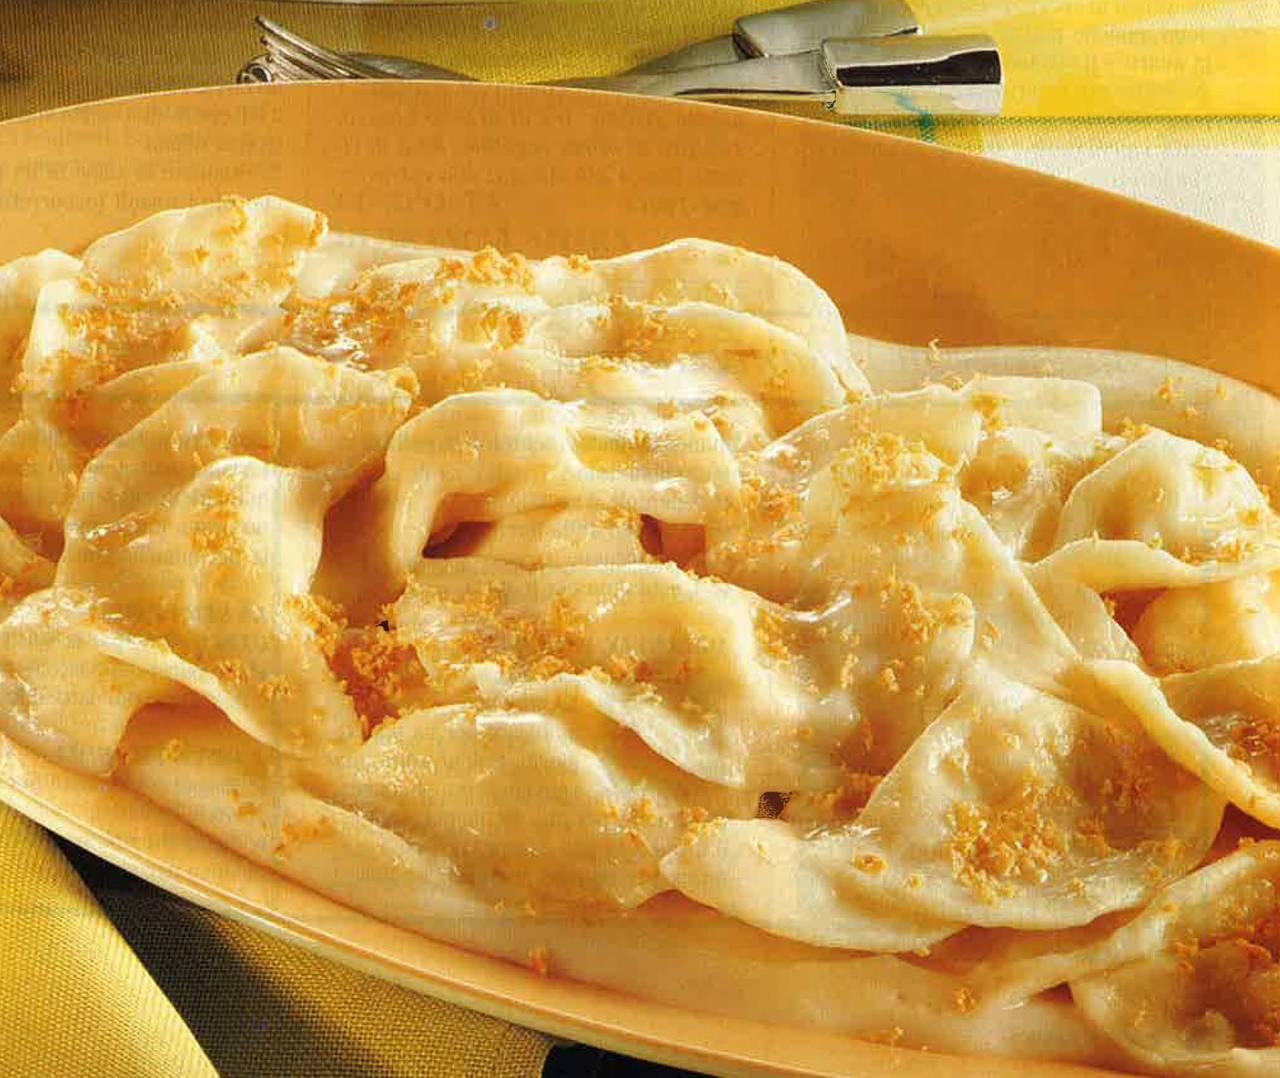 Primo Ricetta Vegetariana Casunzei Di Patate E Ricotta Ricetta Di  #B24D16 1280 1078 Programma Per Creare Ricette Di Cucina